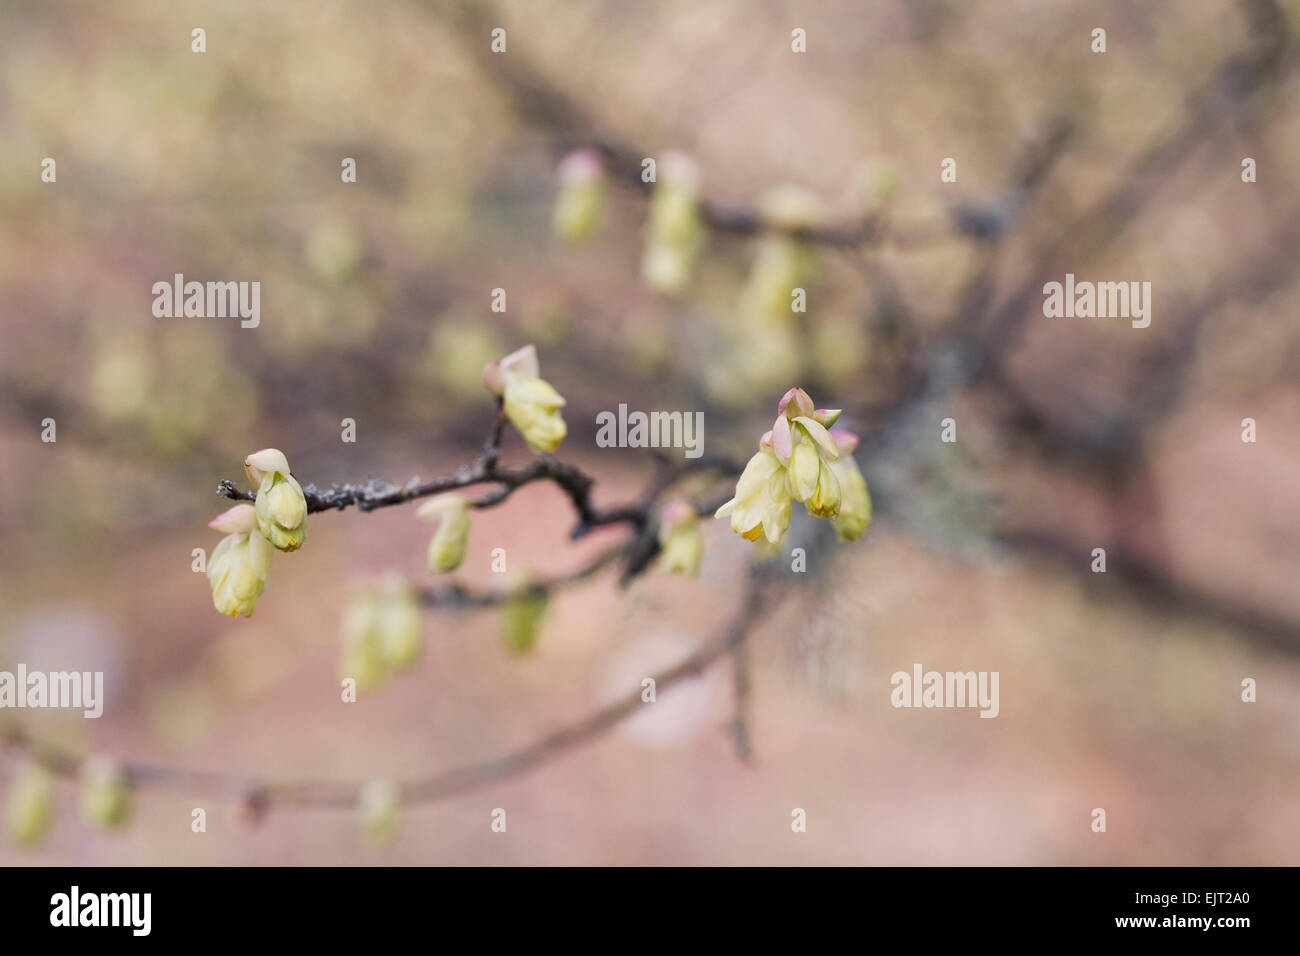 Corylopsis pauciflora flowers in Spring. - Stock Image